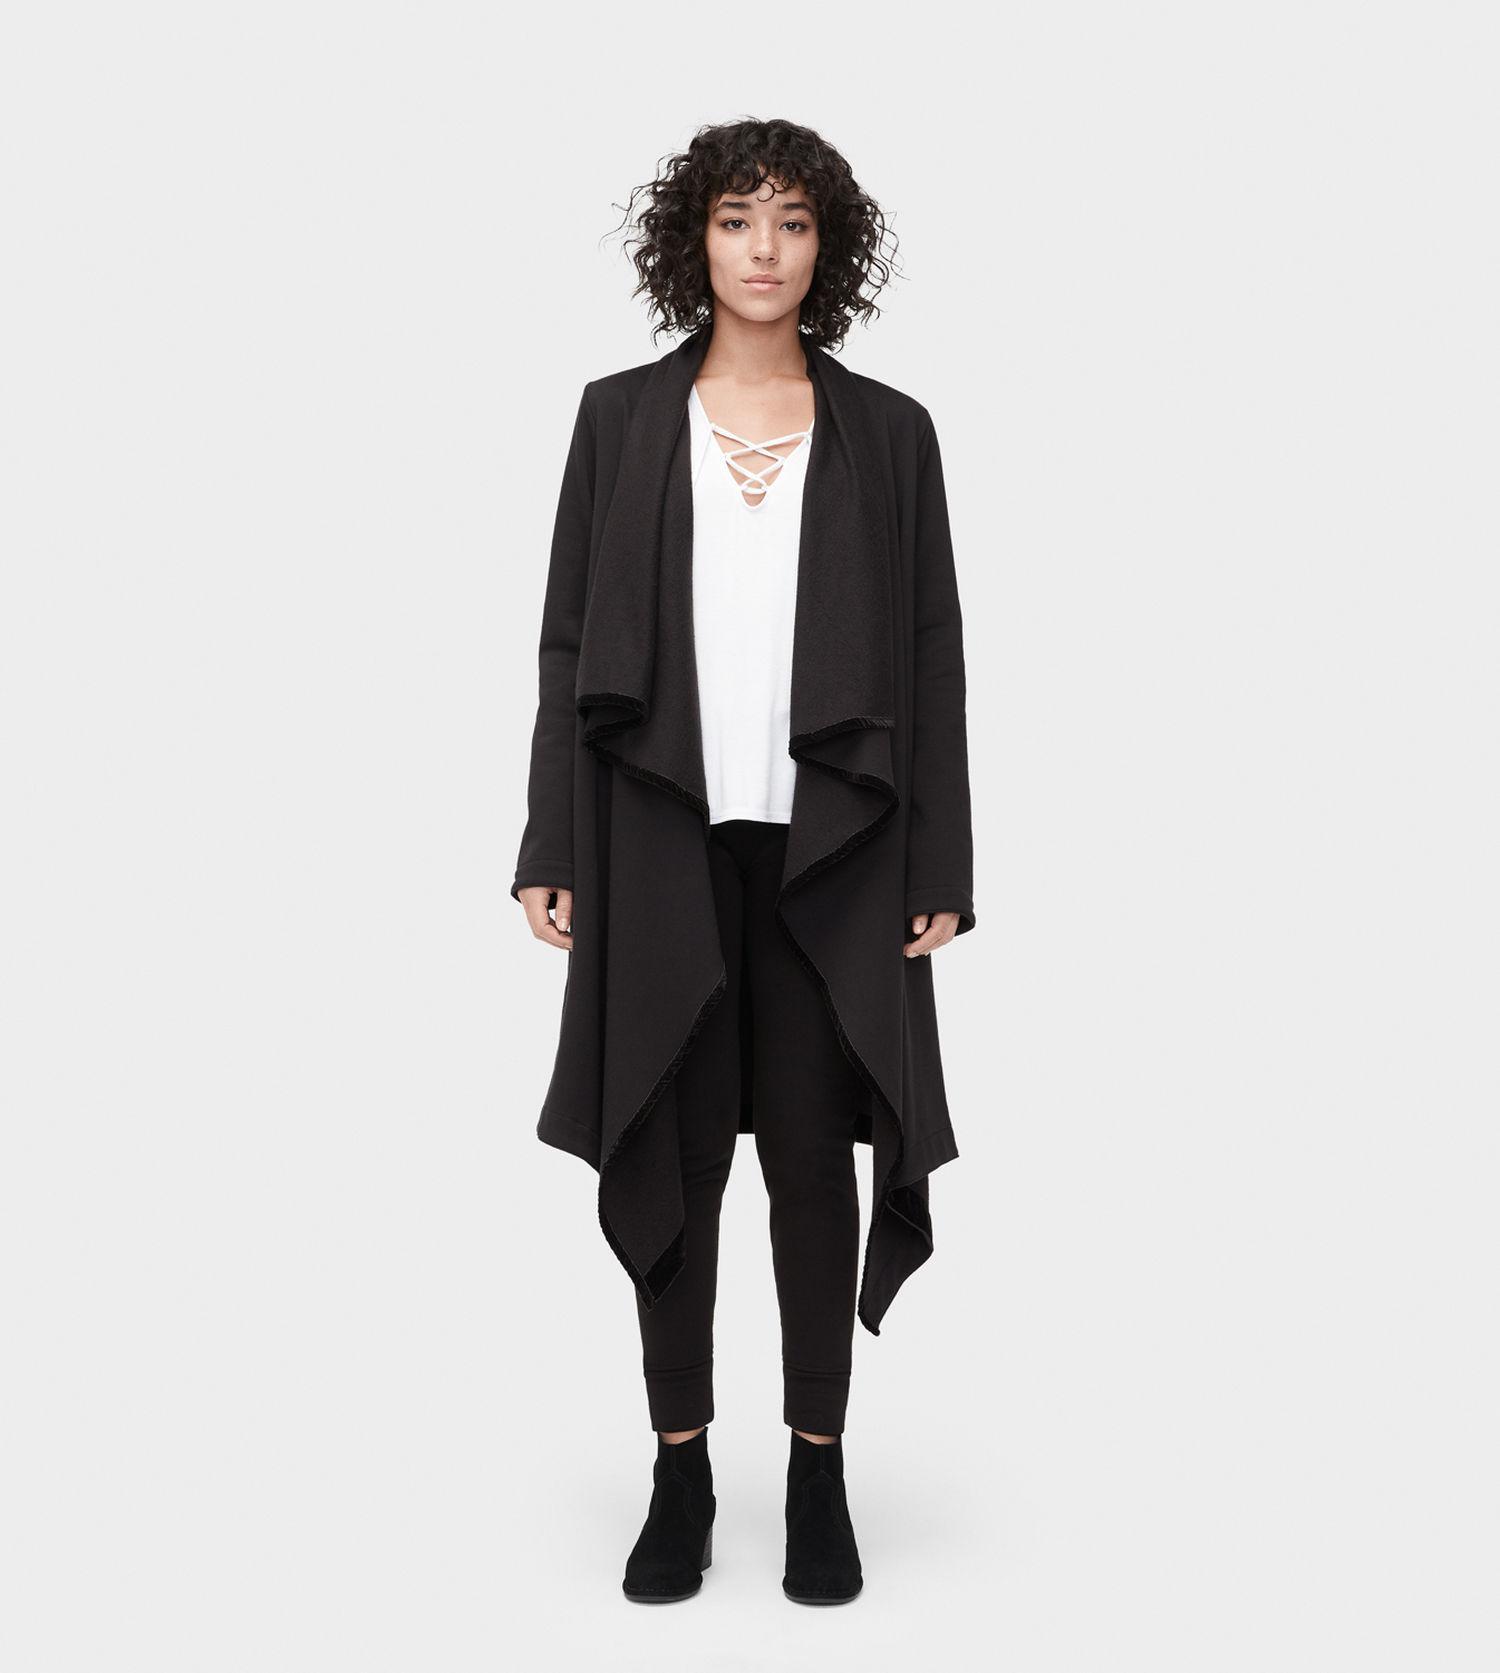 Lyst - UGG Women s Share This Product Janni Fleece Blanket Cardigan ... beb8f4ef3